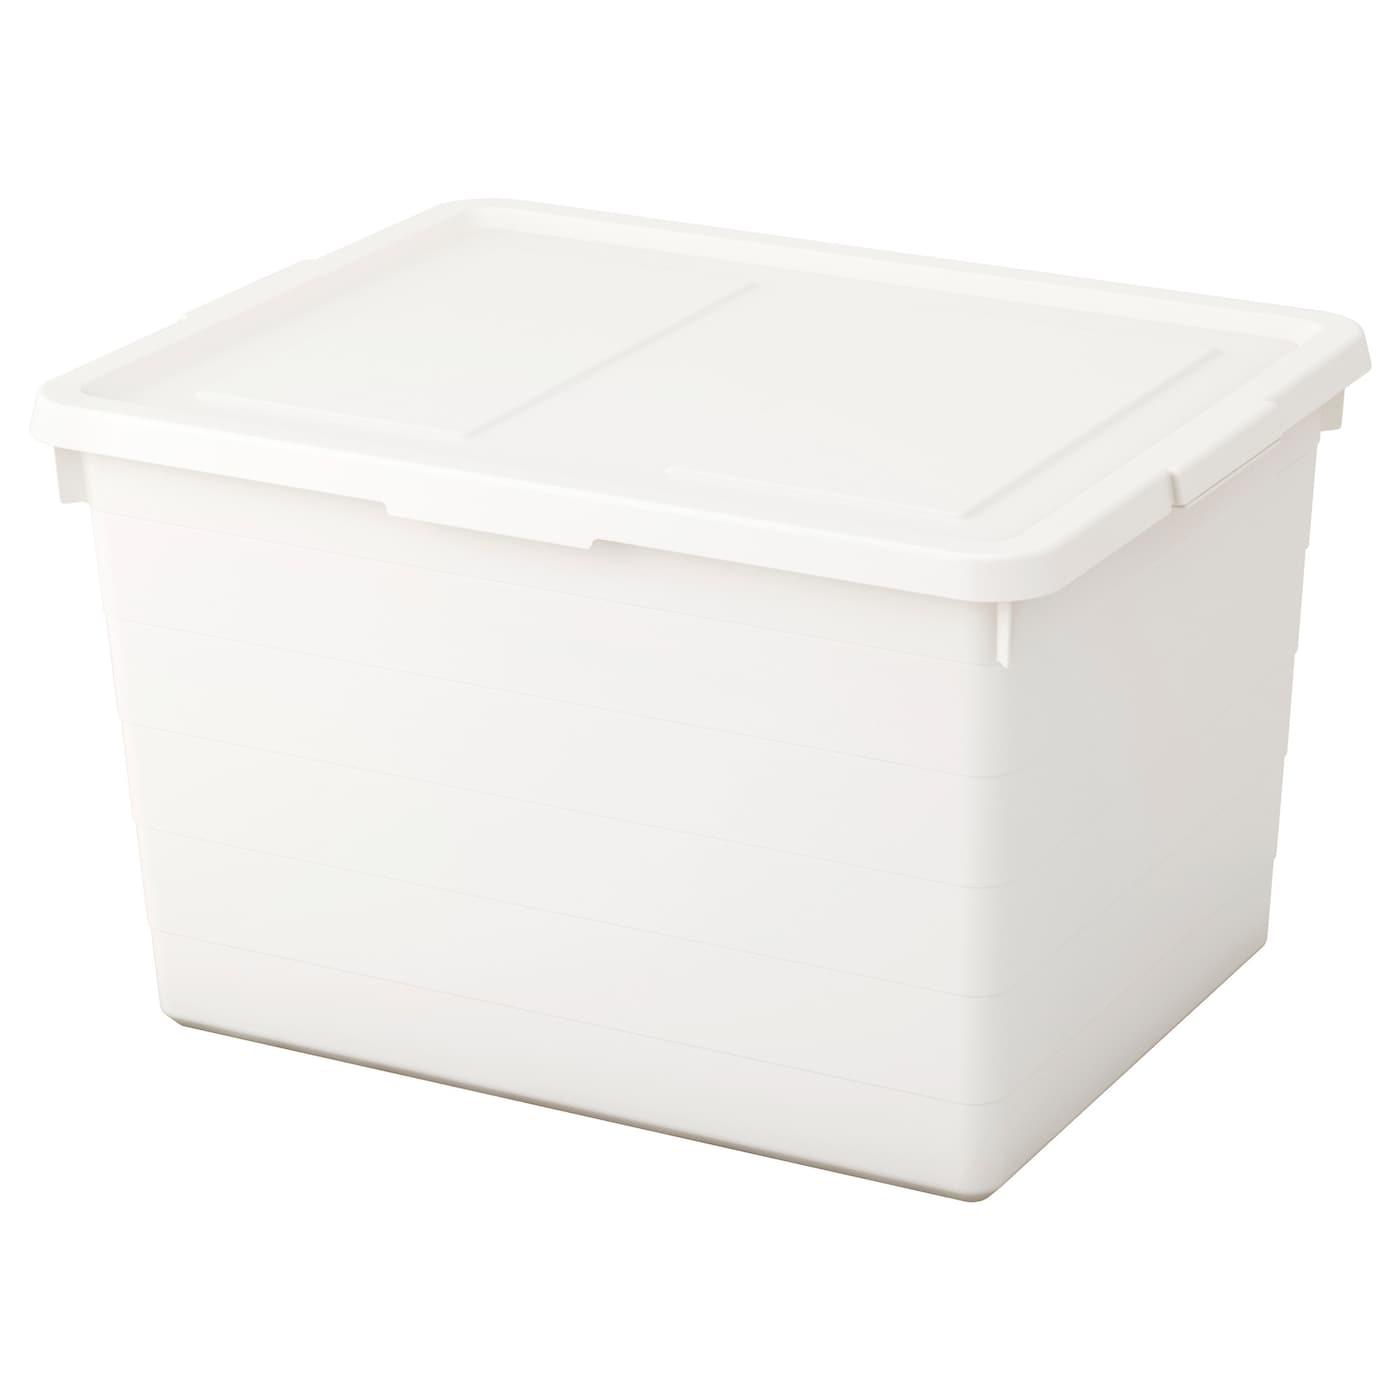 IKEA SOCKERBIT box with lid  sc 1 st  Ikea & Plastic Storage Boxes u0026 Wooden Storage Boxes | IKEA